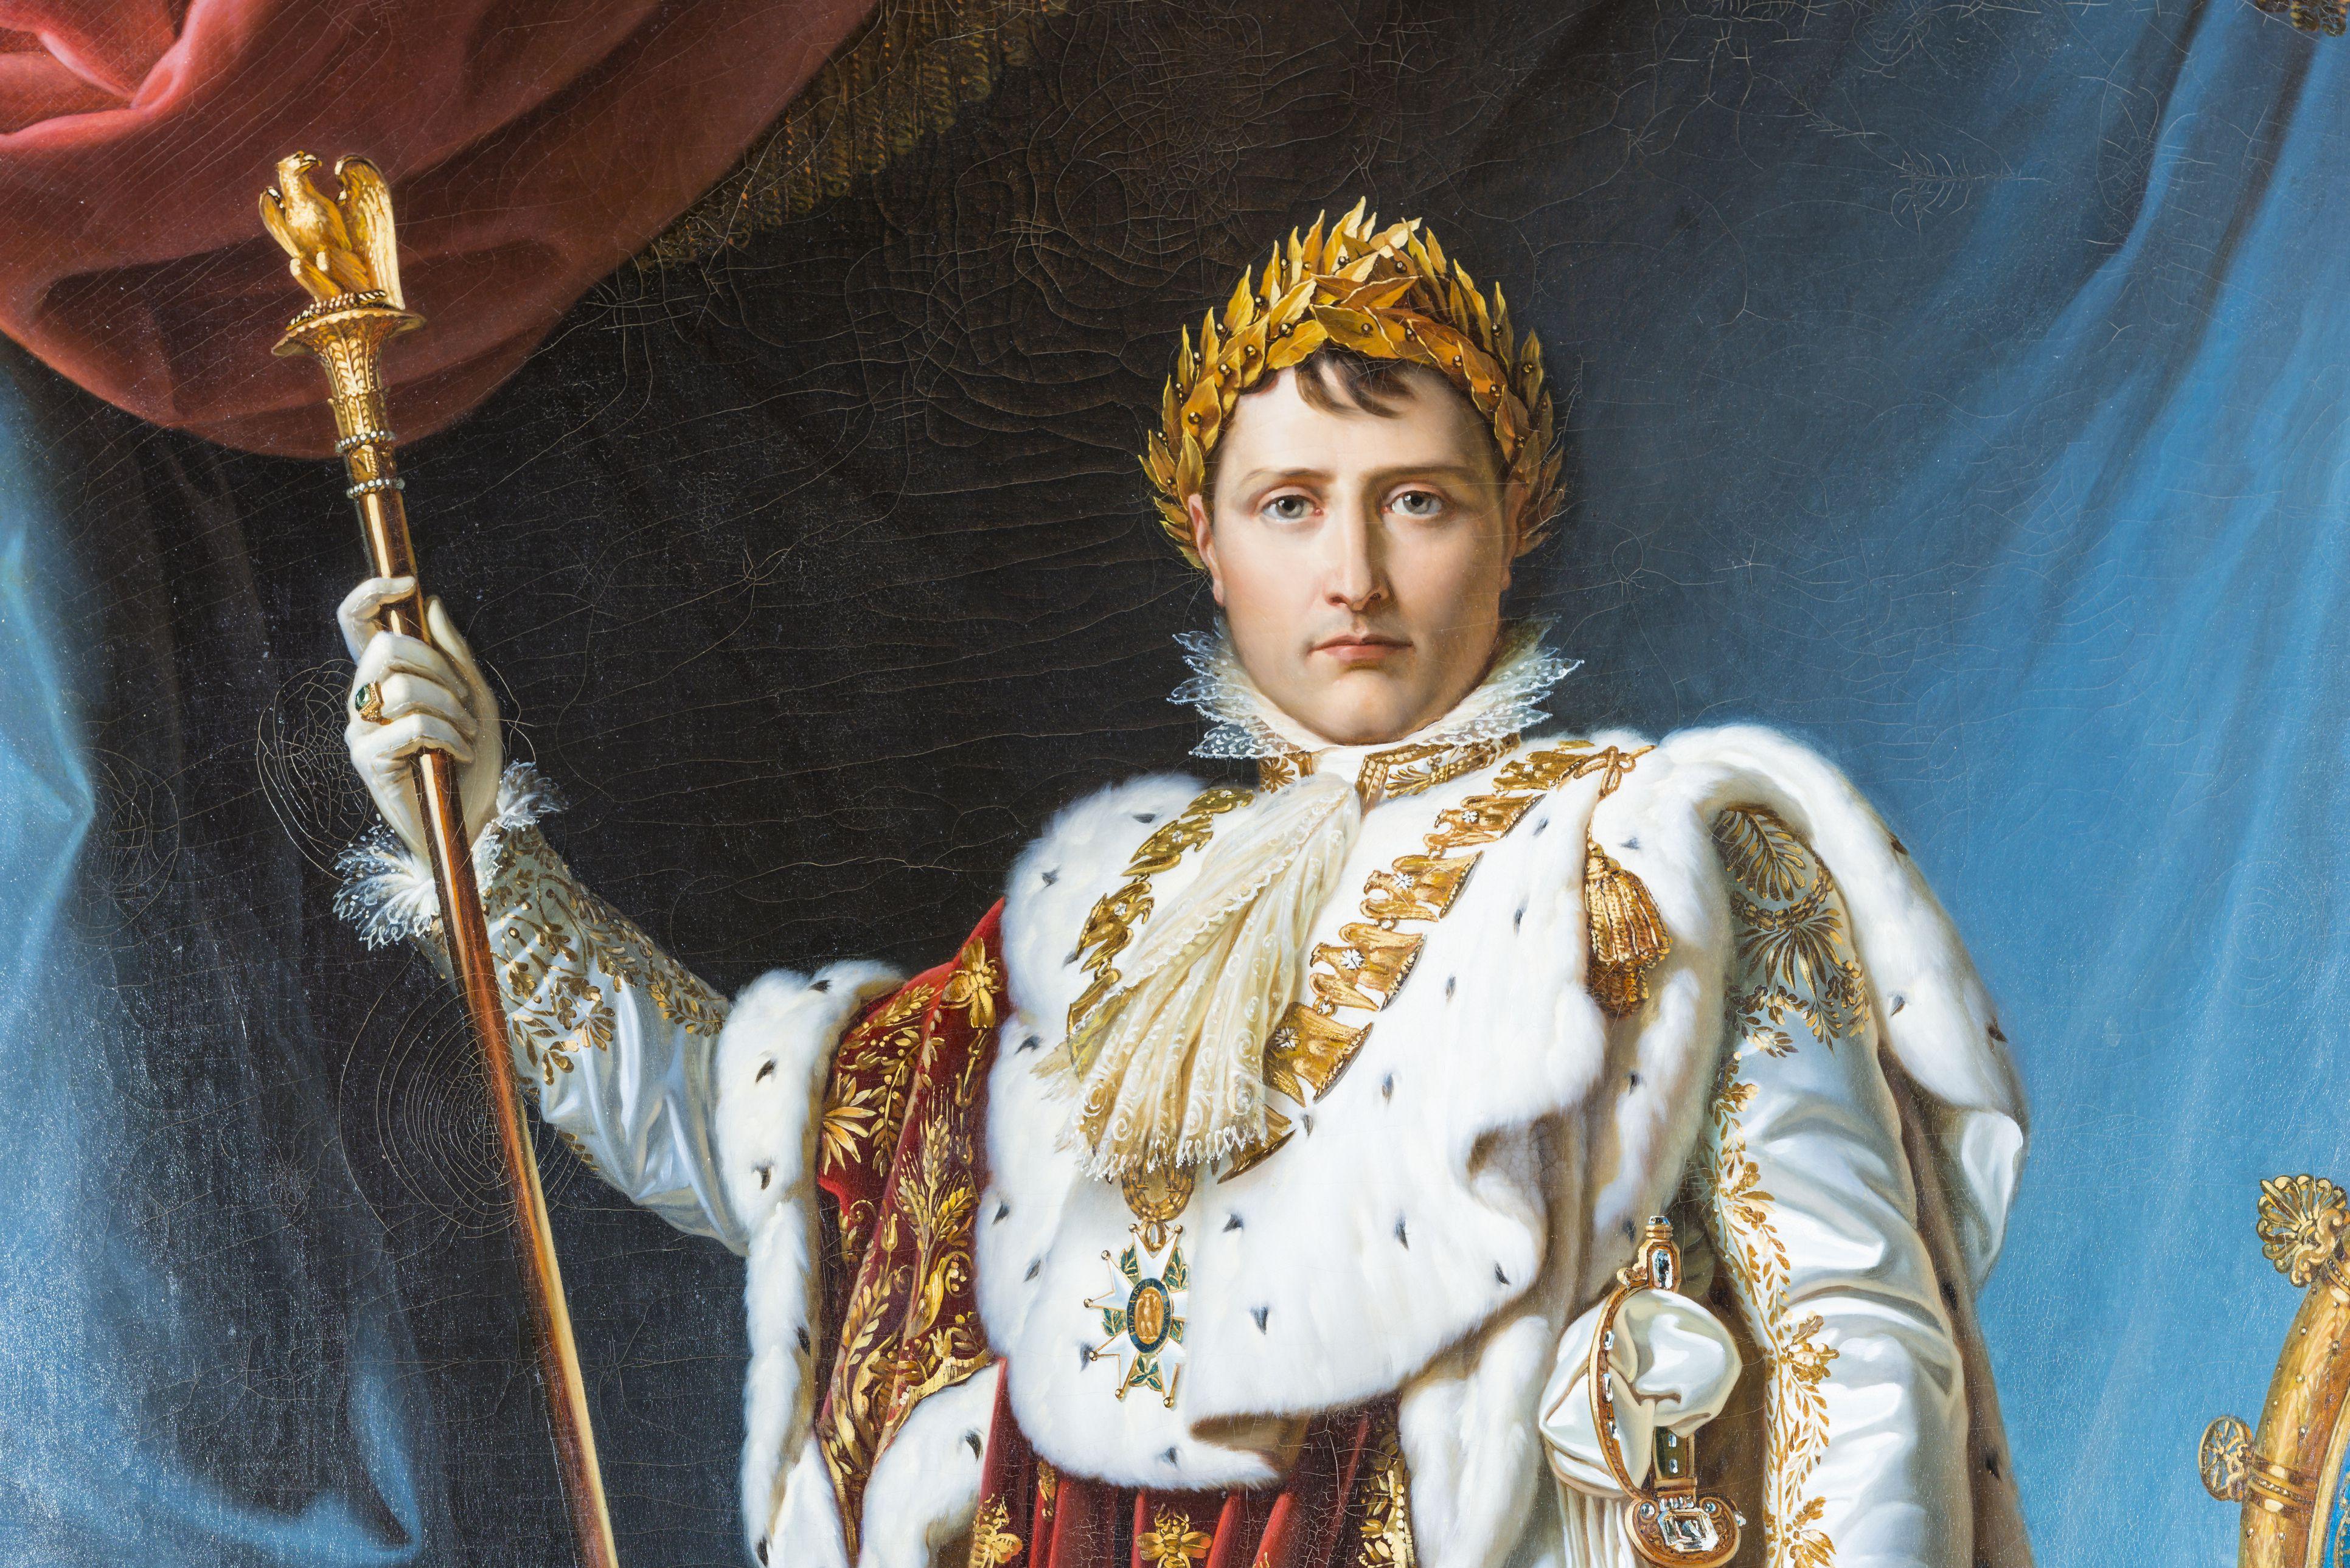 Painted portrait of Napoleon Bonaparte by baron Francois Gerard